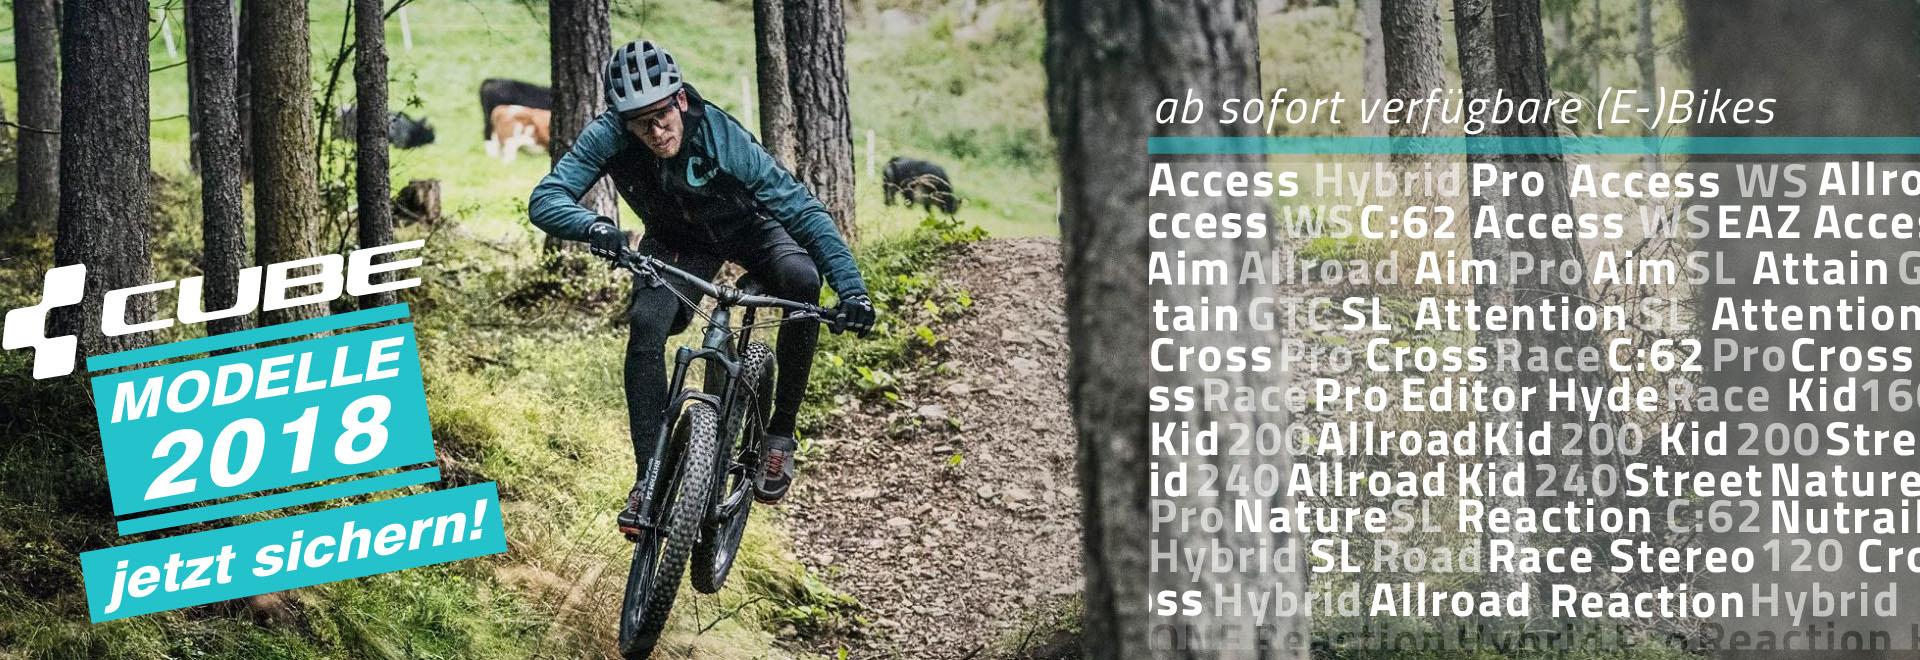 sofort Verfügbare Cube 2018 Fahrräder & E-Bikes bei Denfeld Bad Homburg